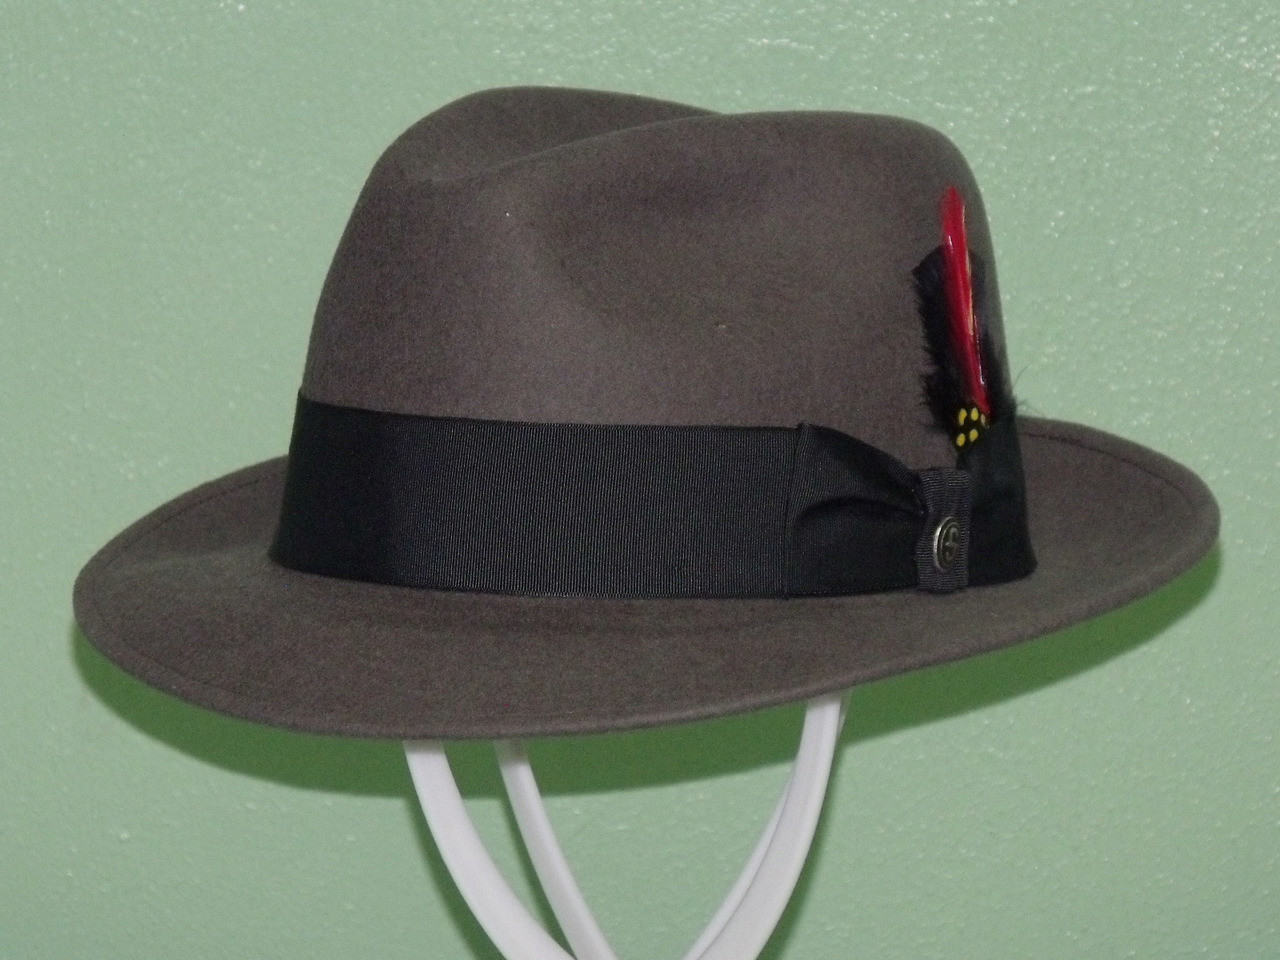 Stetson Frederick Wool Fedora Hat - One 2 mini Ranch d53706aa12f